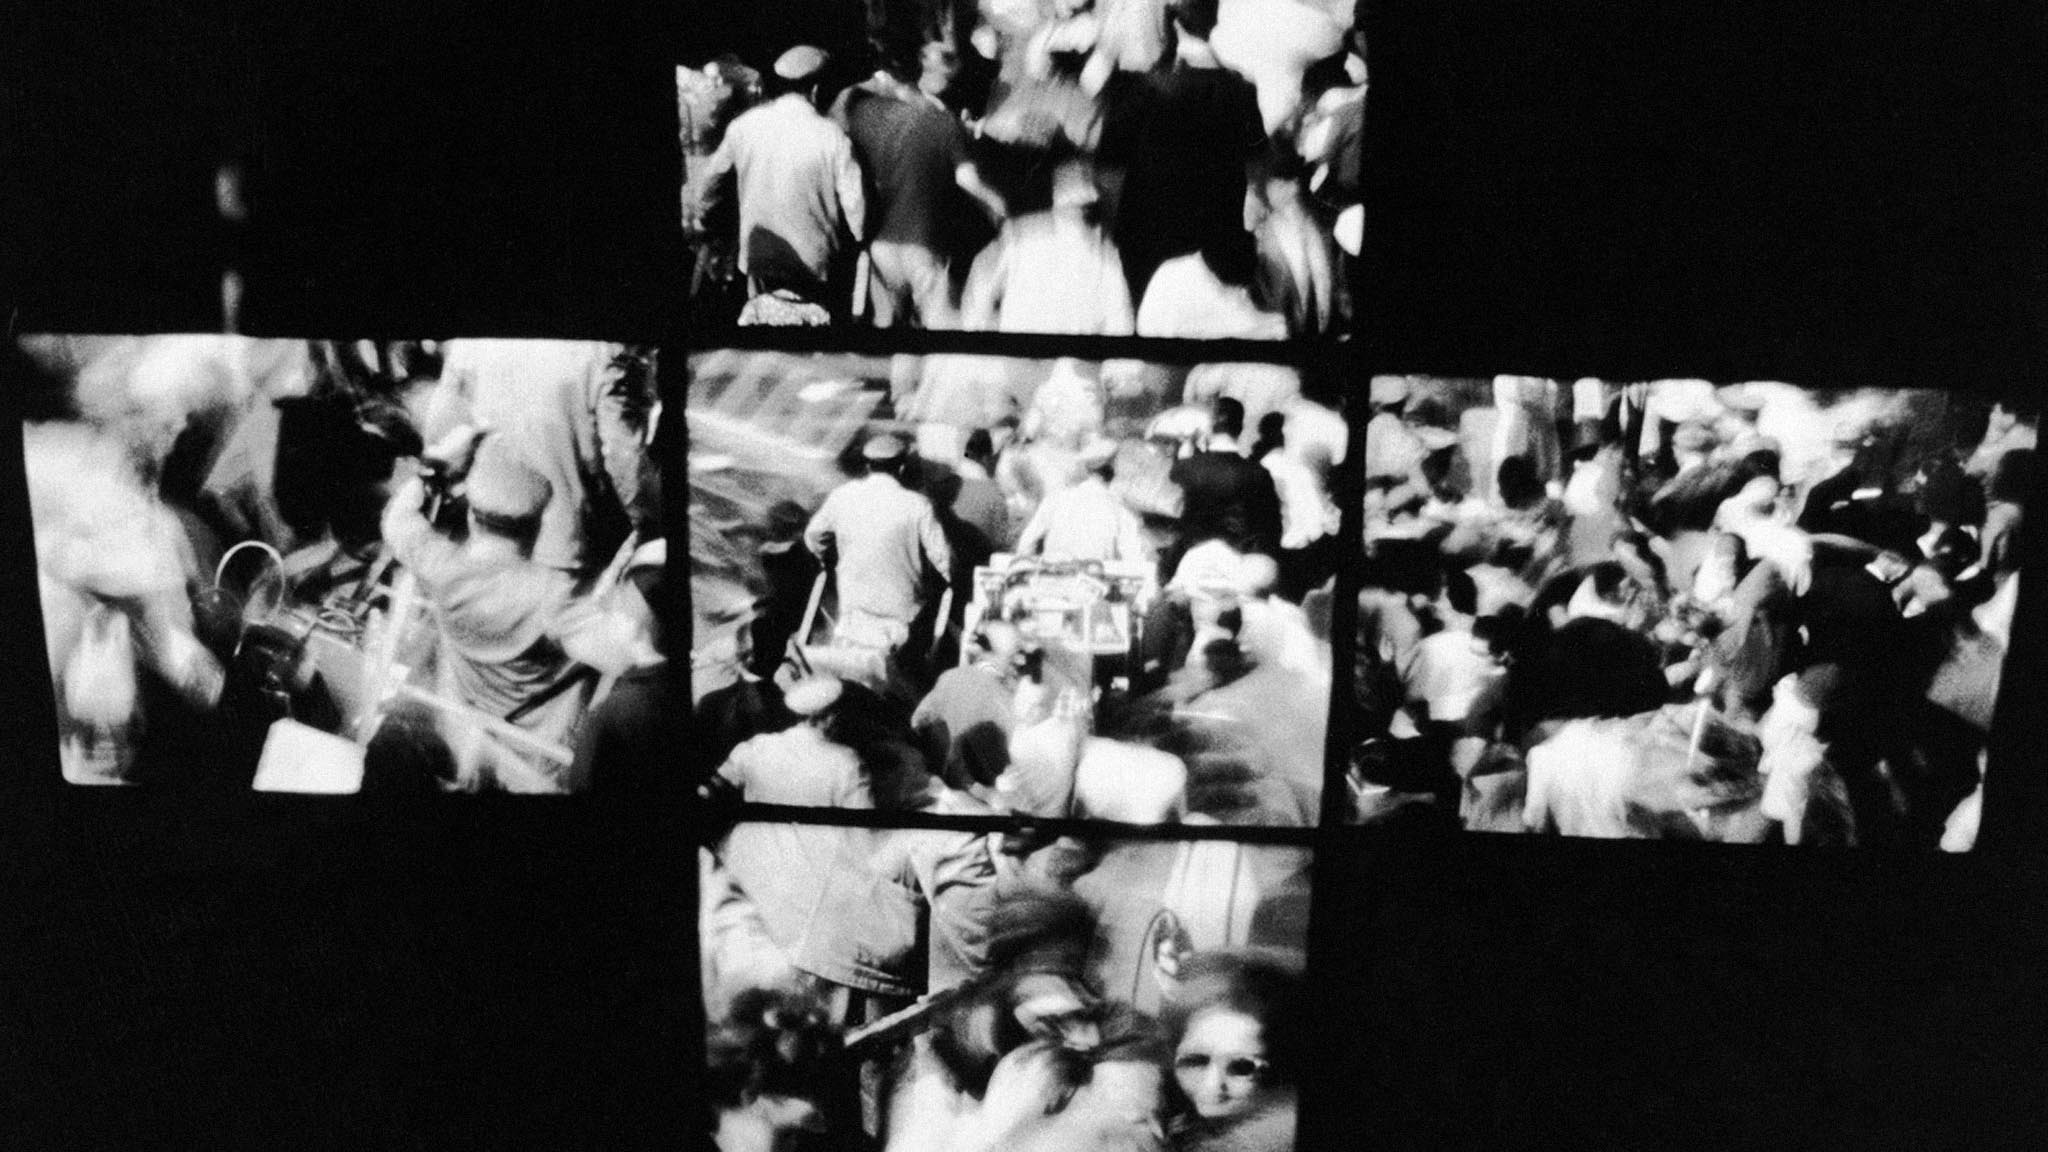 Expo 67 : 50 ans déjà!